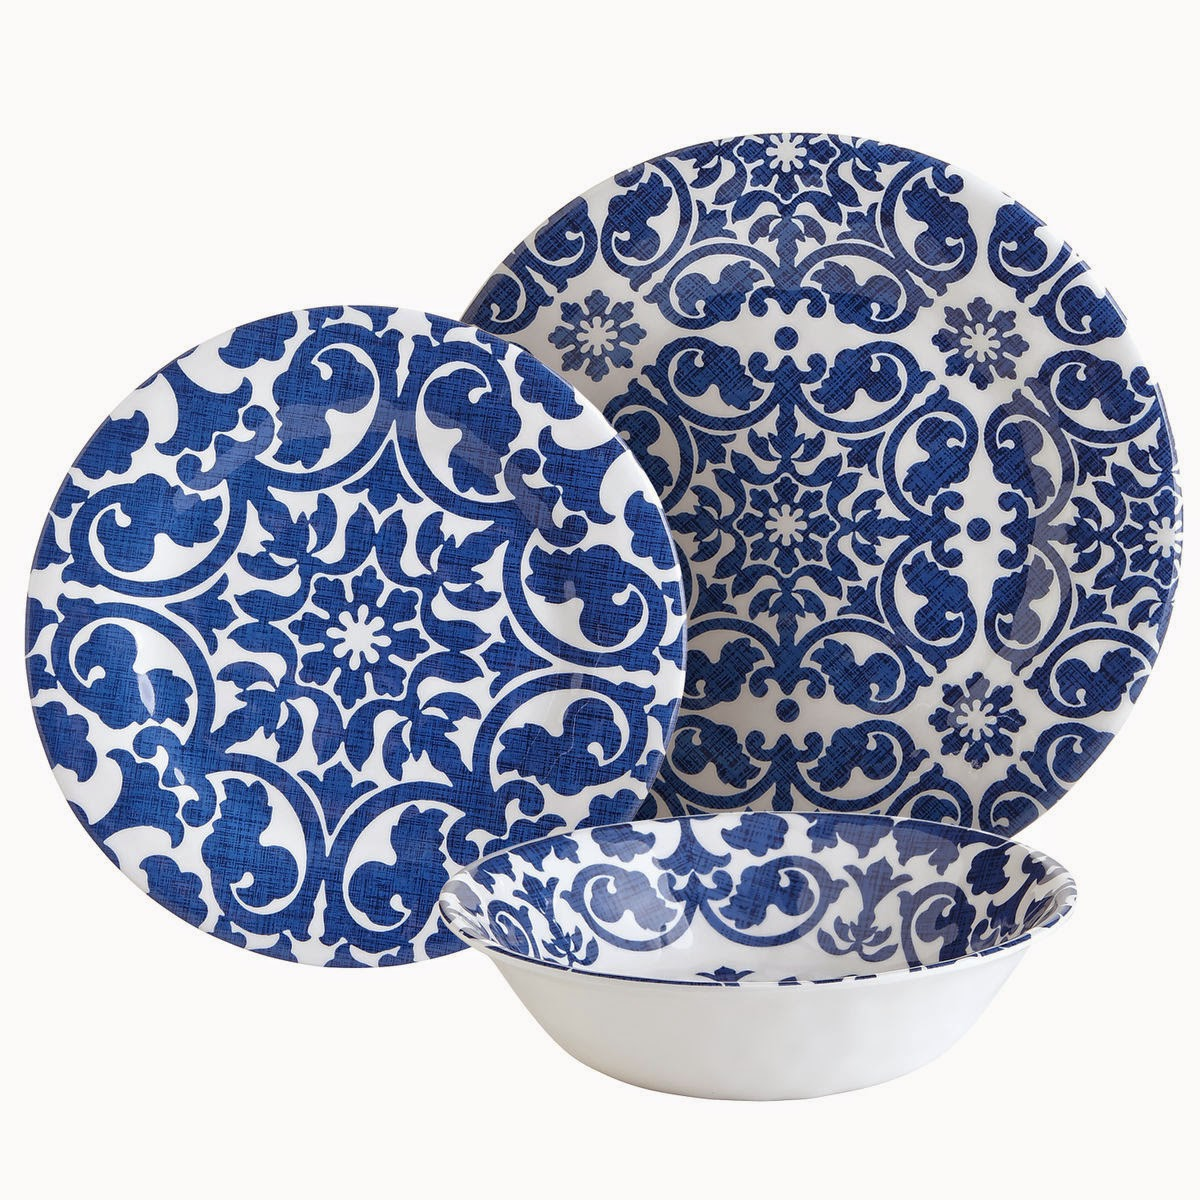 http://www.anrdoezrs.net/click-7629704-11401336-1407788610000?url=http%3A%2F%2Fwww.pier1.com%2FTrellis-Melamine-Dinnerware---Blue%2FPS57129%2Cdefault%2Cpd.html&cjsku=PS57129